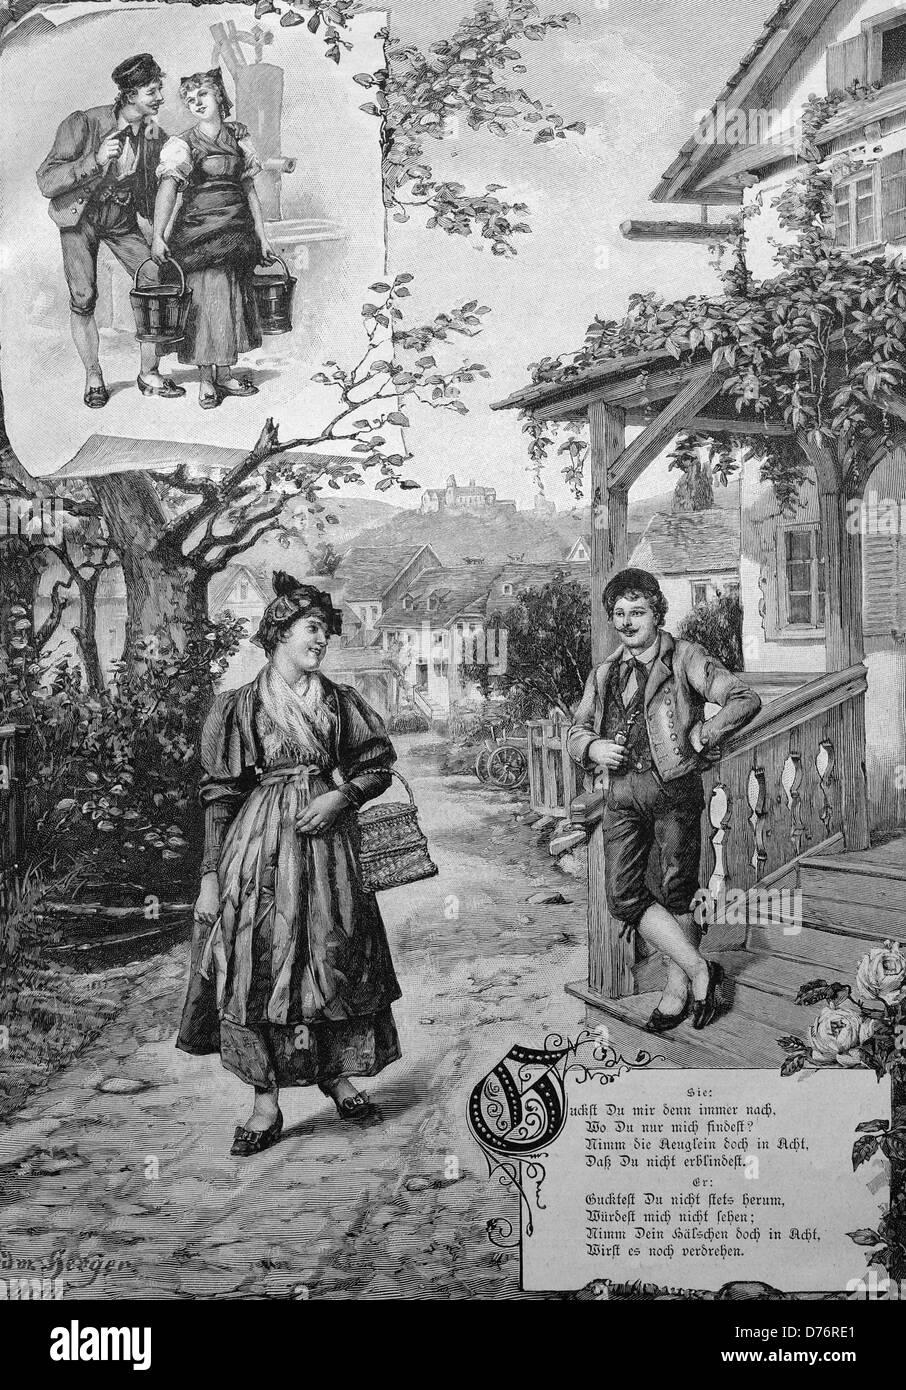 Love poem, couple around 1870, historical illustration - Stock Image